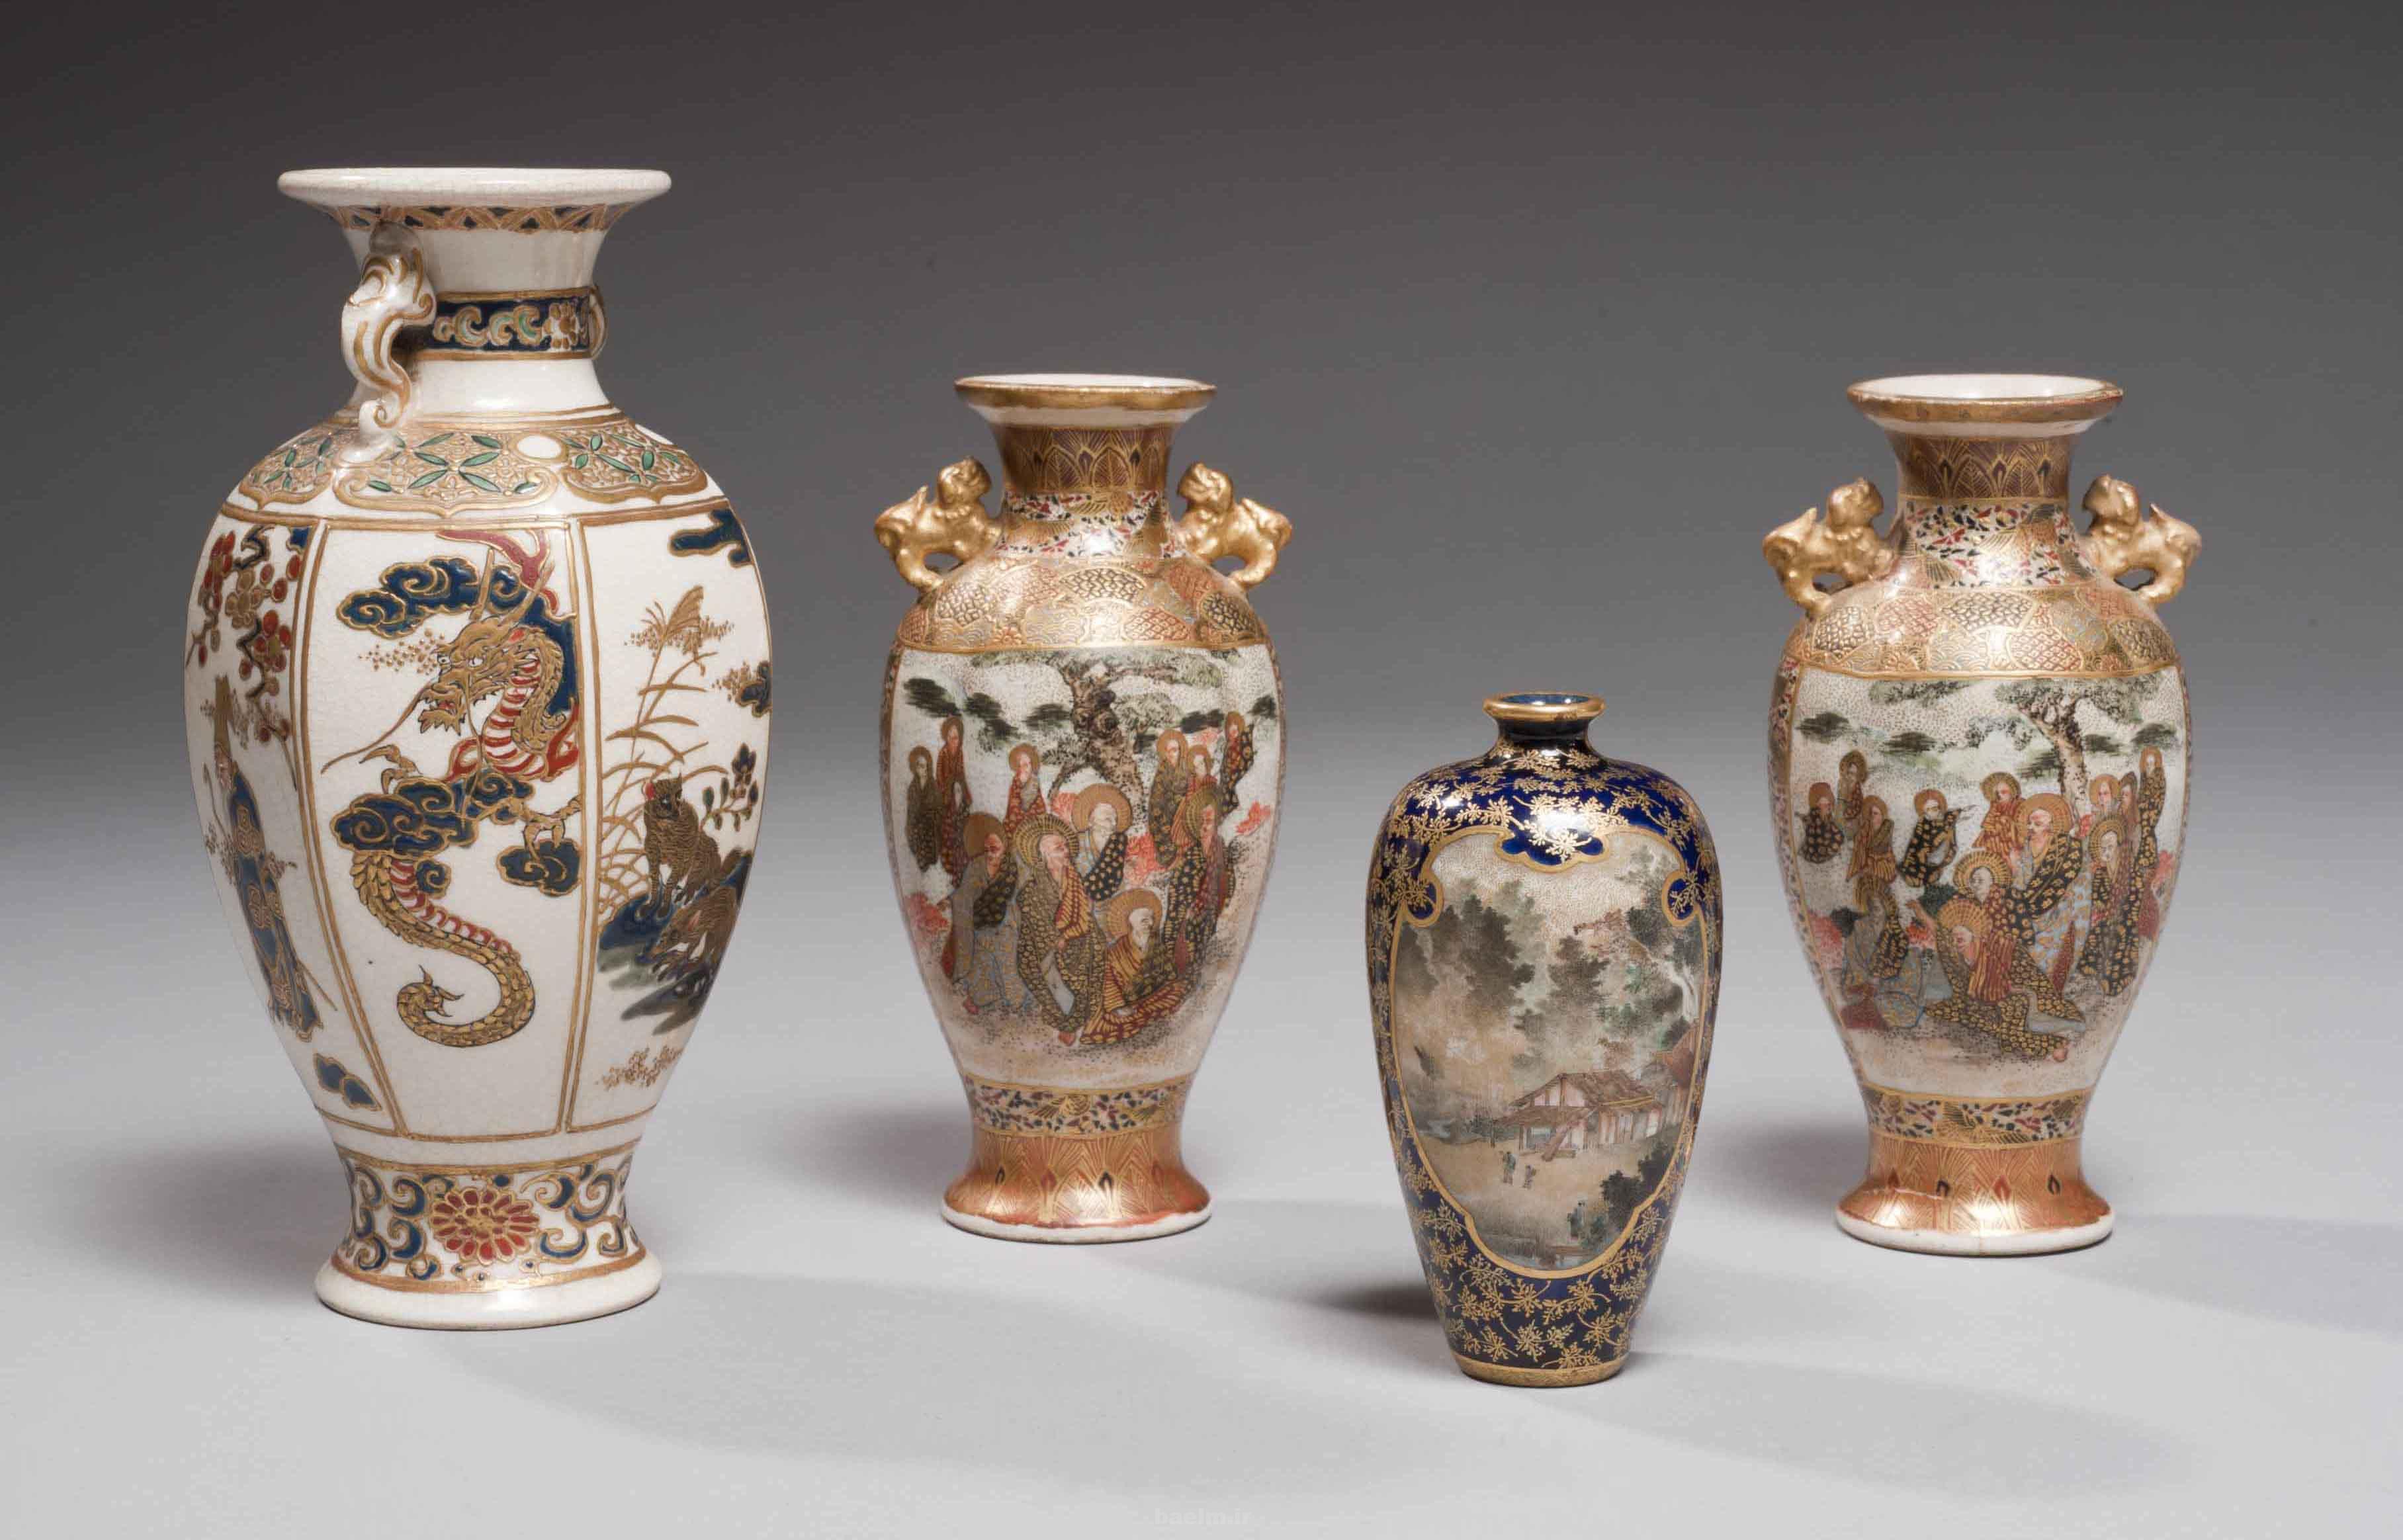 vases 5 Beautiful Vases